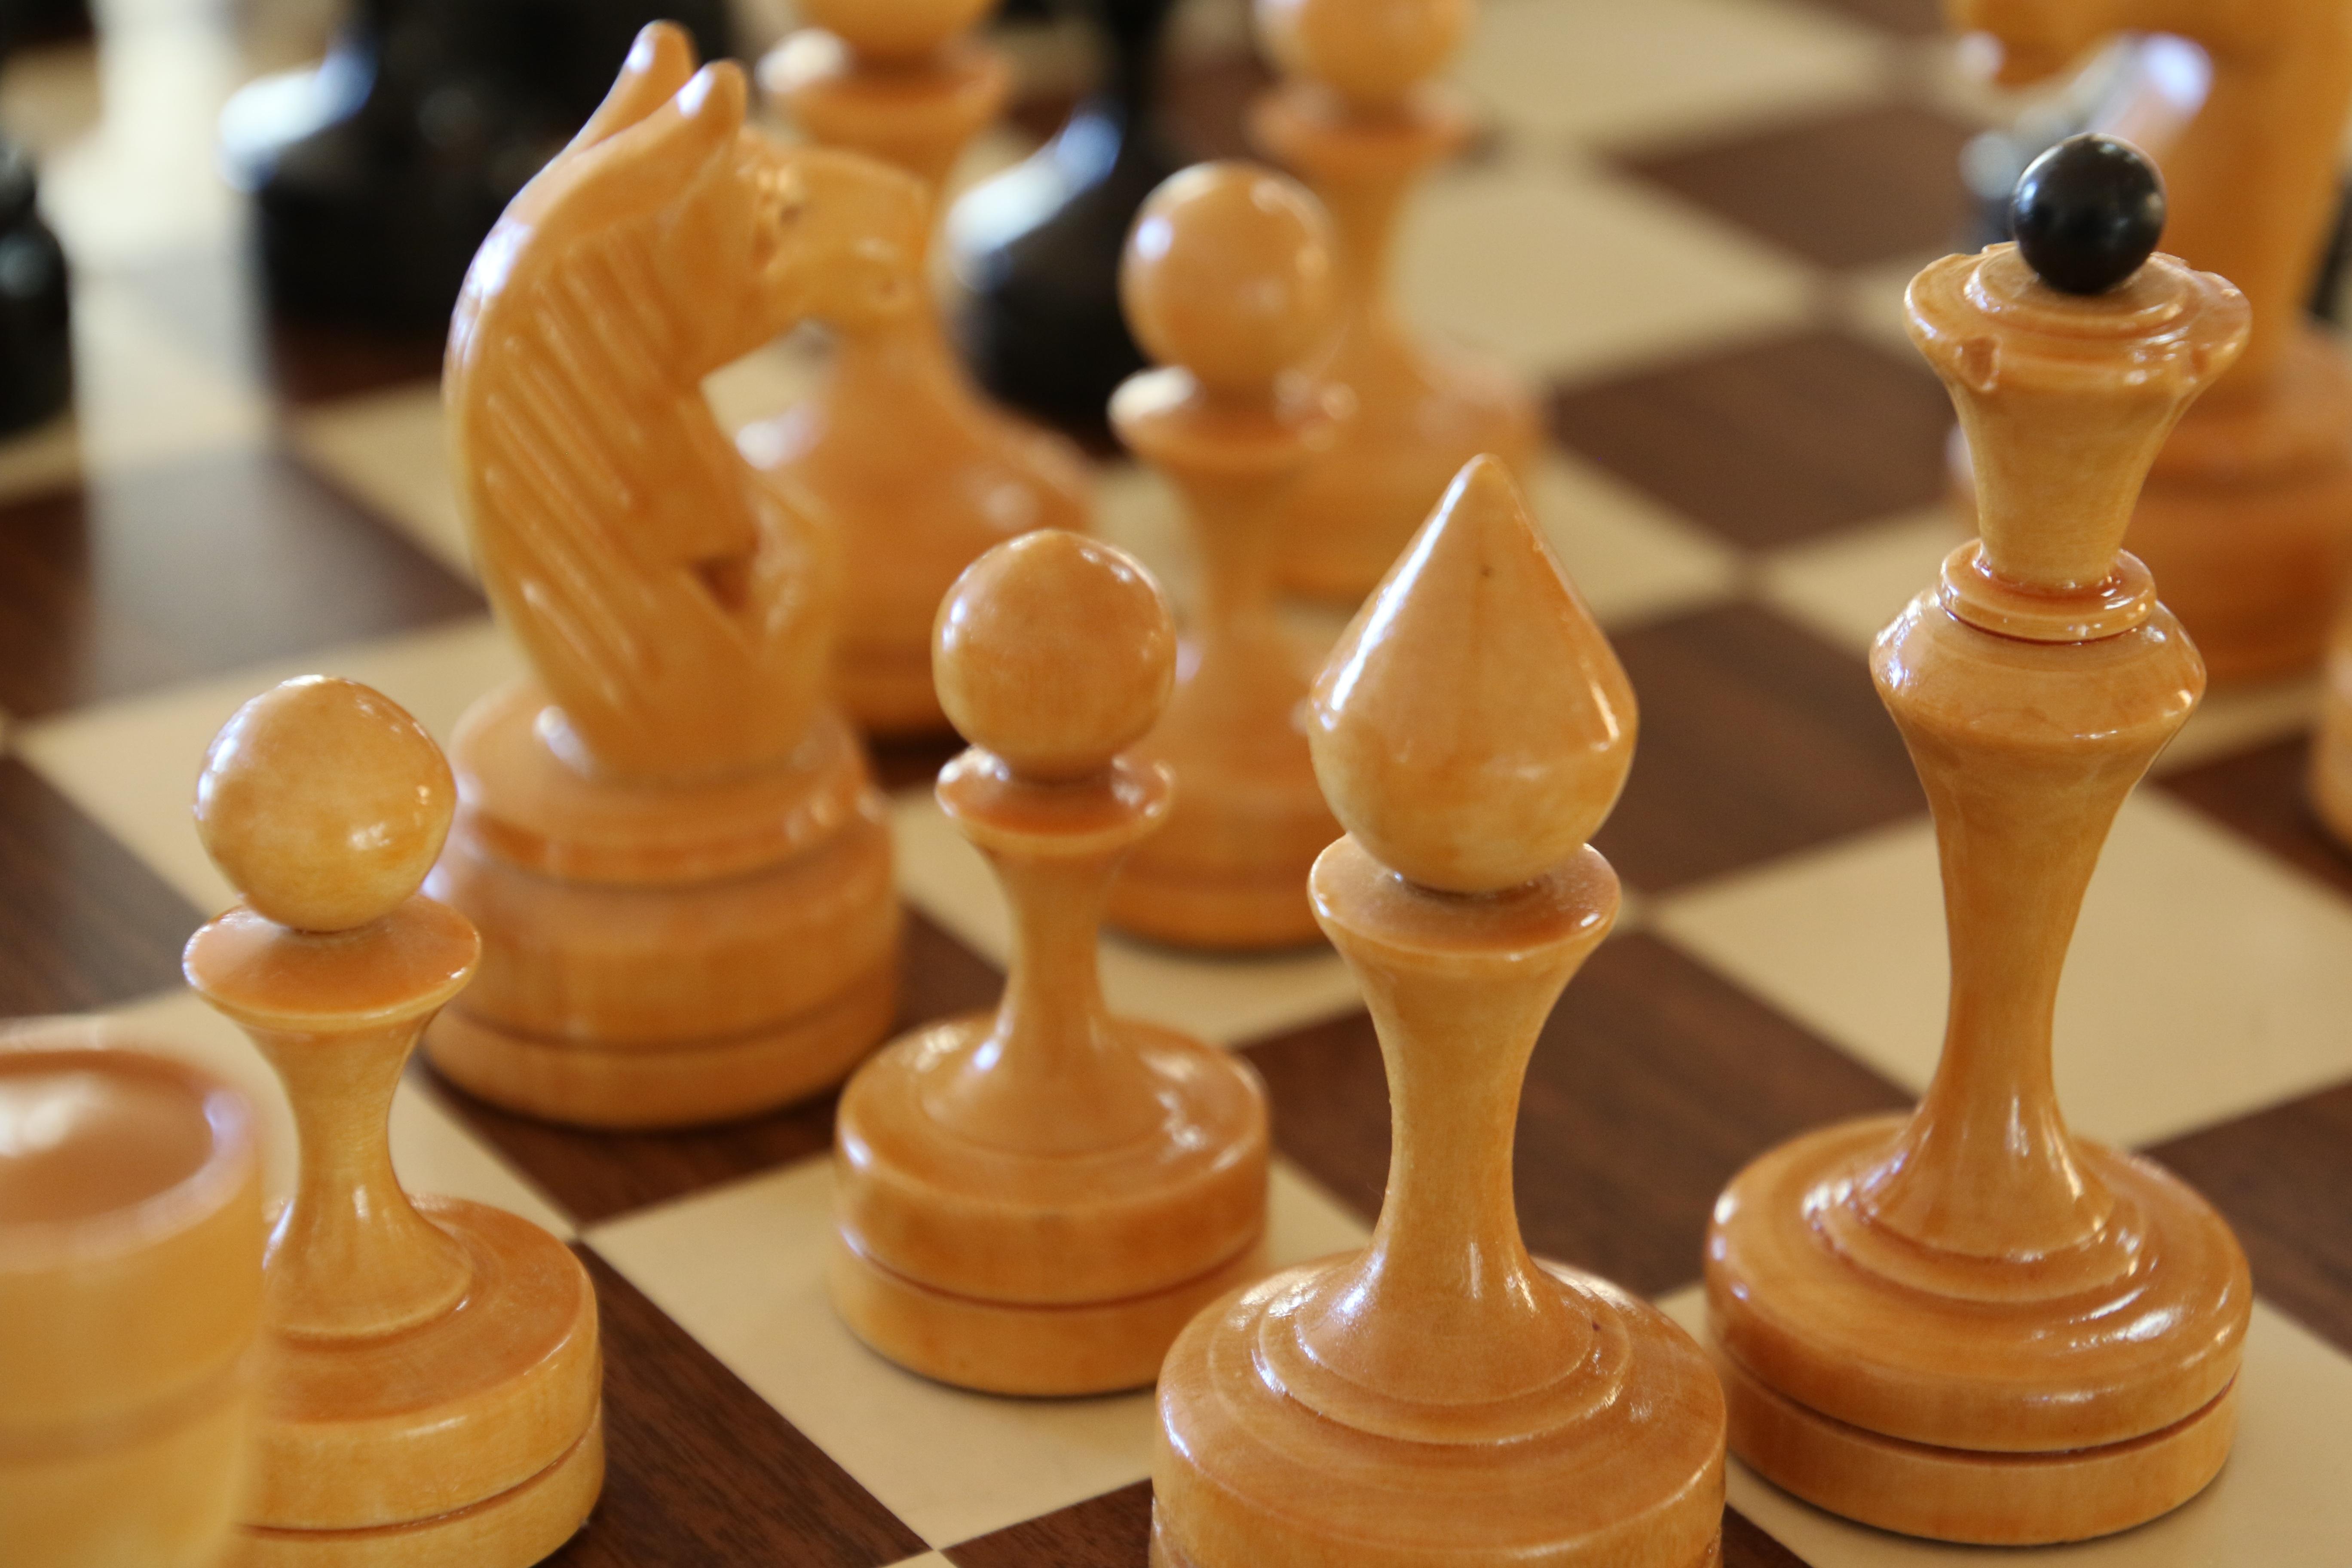 школе победа в шахматах картинки то, что изба